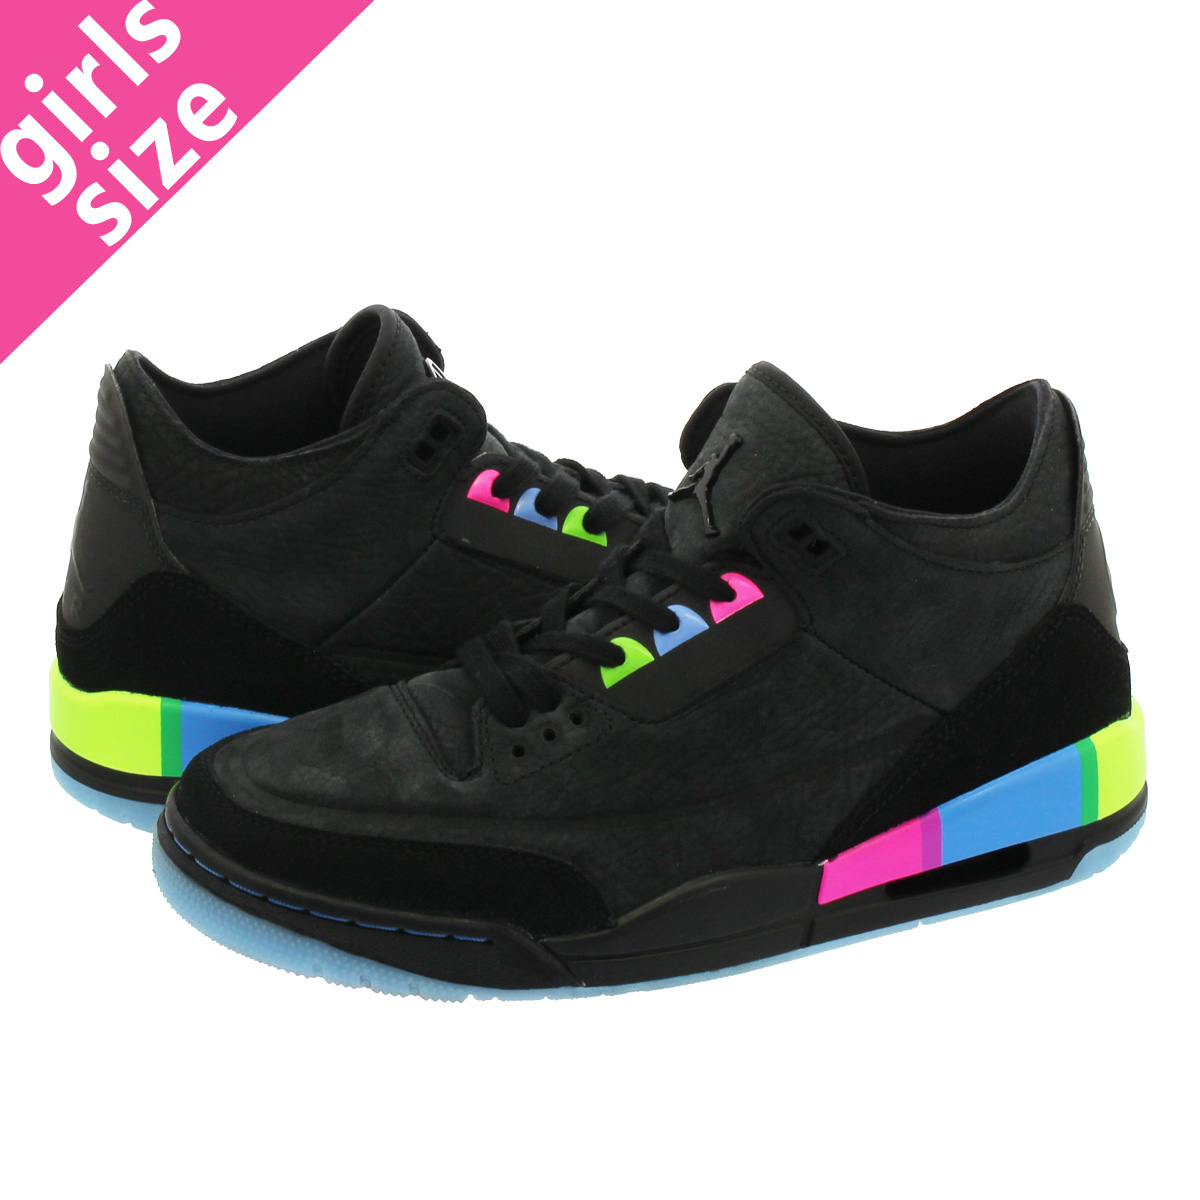 5621760d9ca74a NIKE AIR JORDAN 3 RETRO BG Nike Air Jordan 3 nostalgic BG BLACK ELECTRIC  GREEN at9194-001